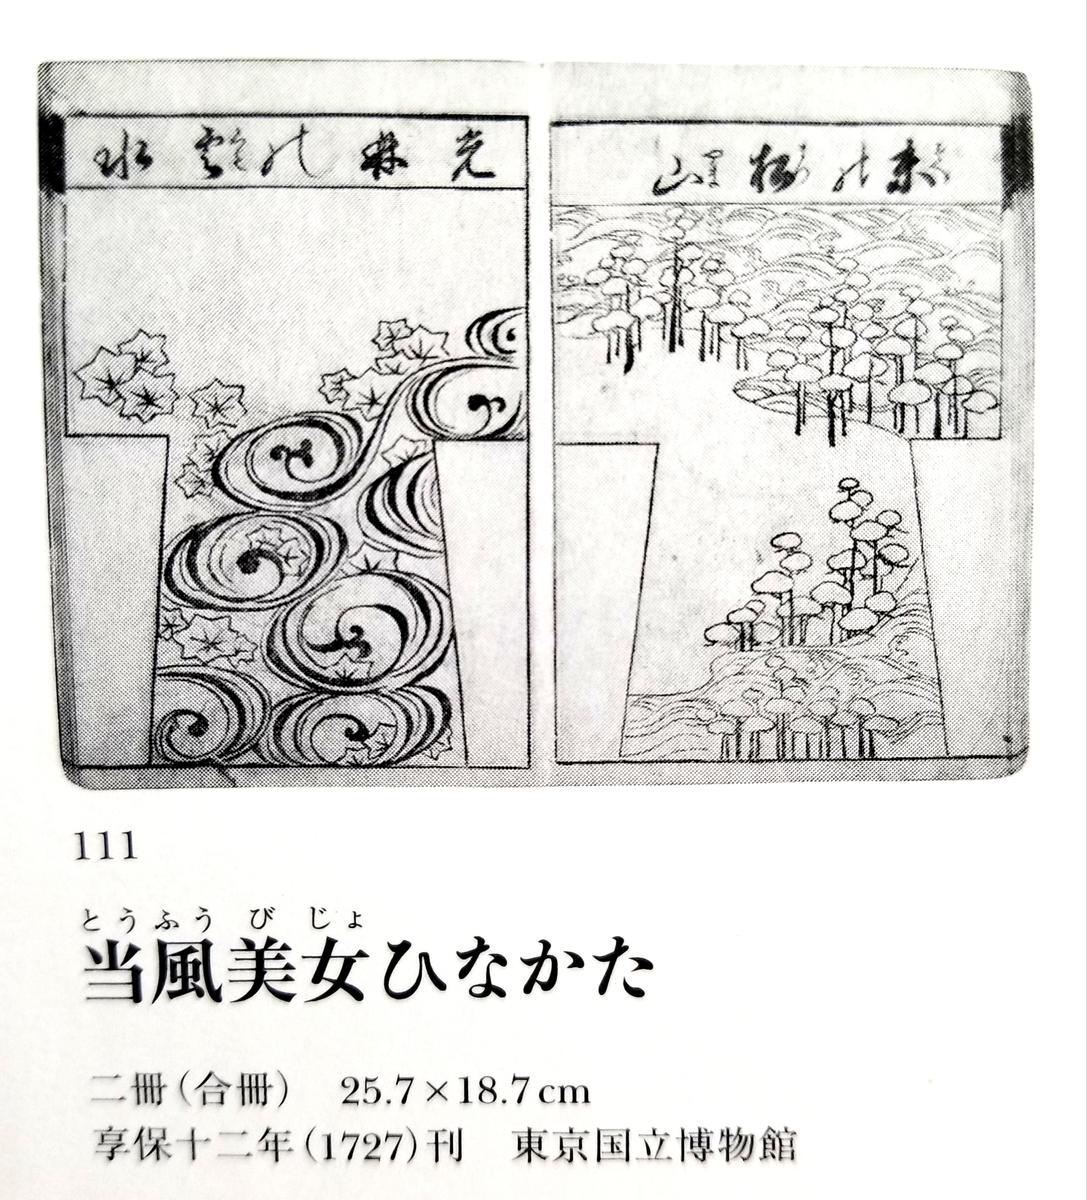 f:id:akashiaya:20200401215212j:plain